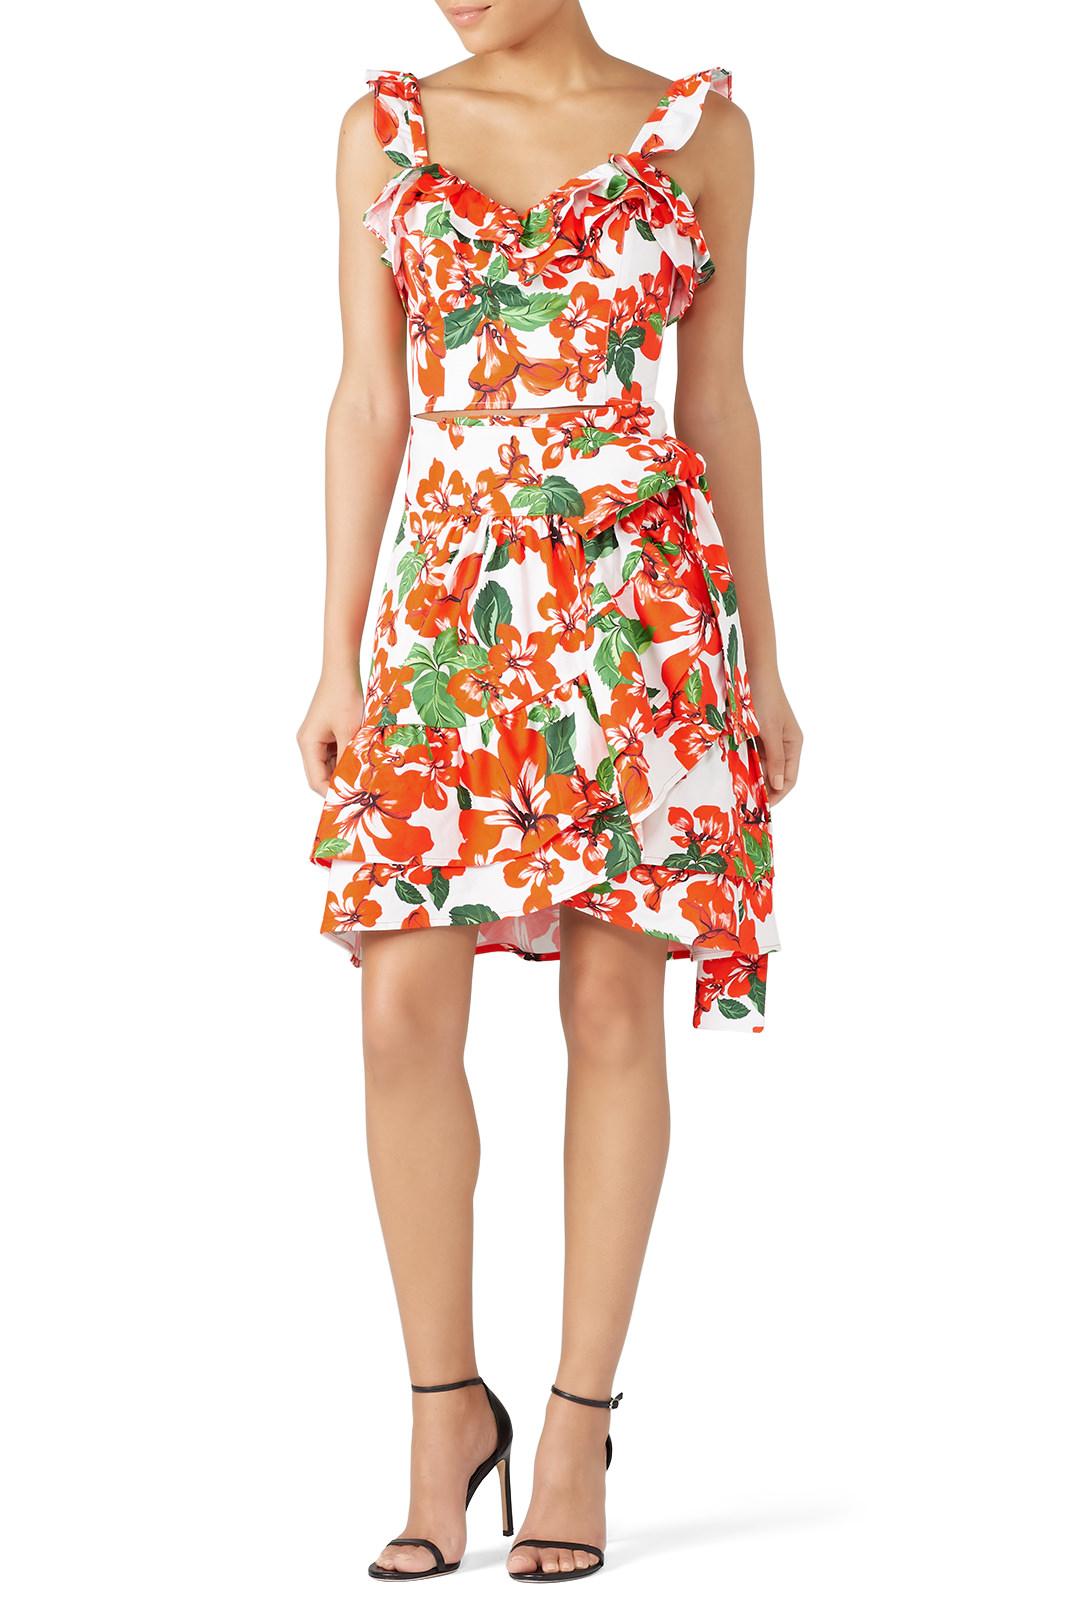 Marissa Webb Milos Print Wrap Skirt & top - Love me a matching set. Make sure you snag the top as well.